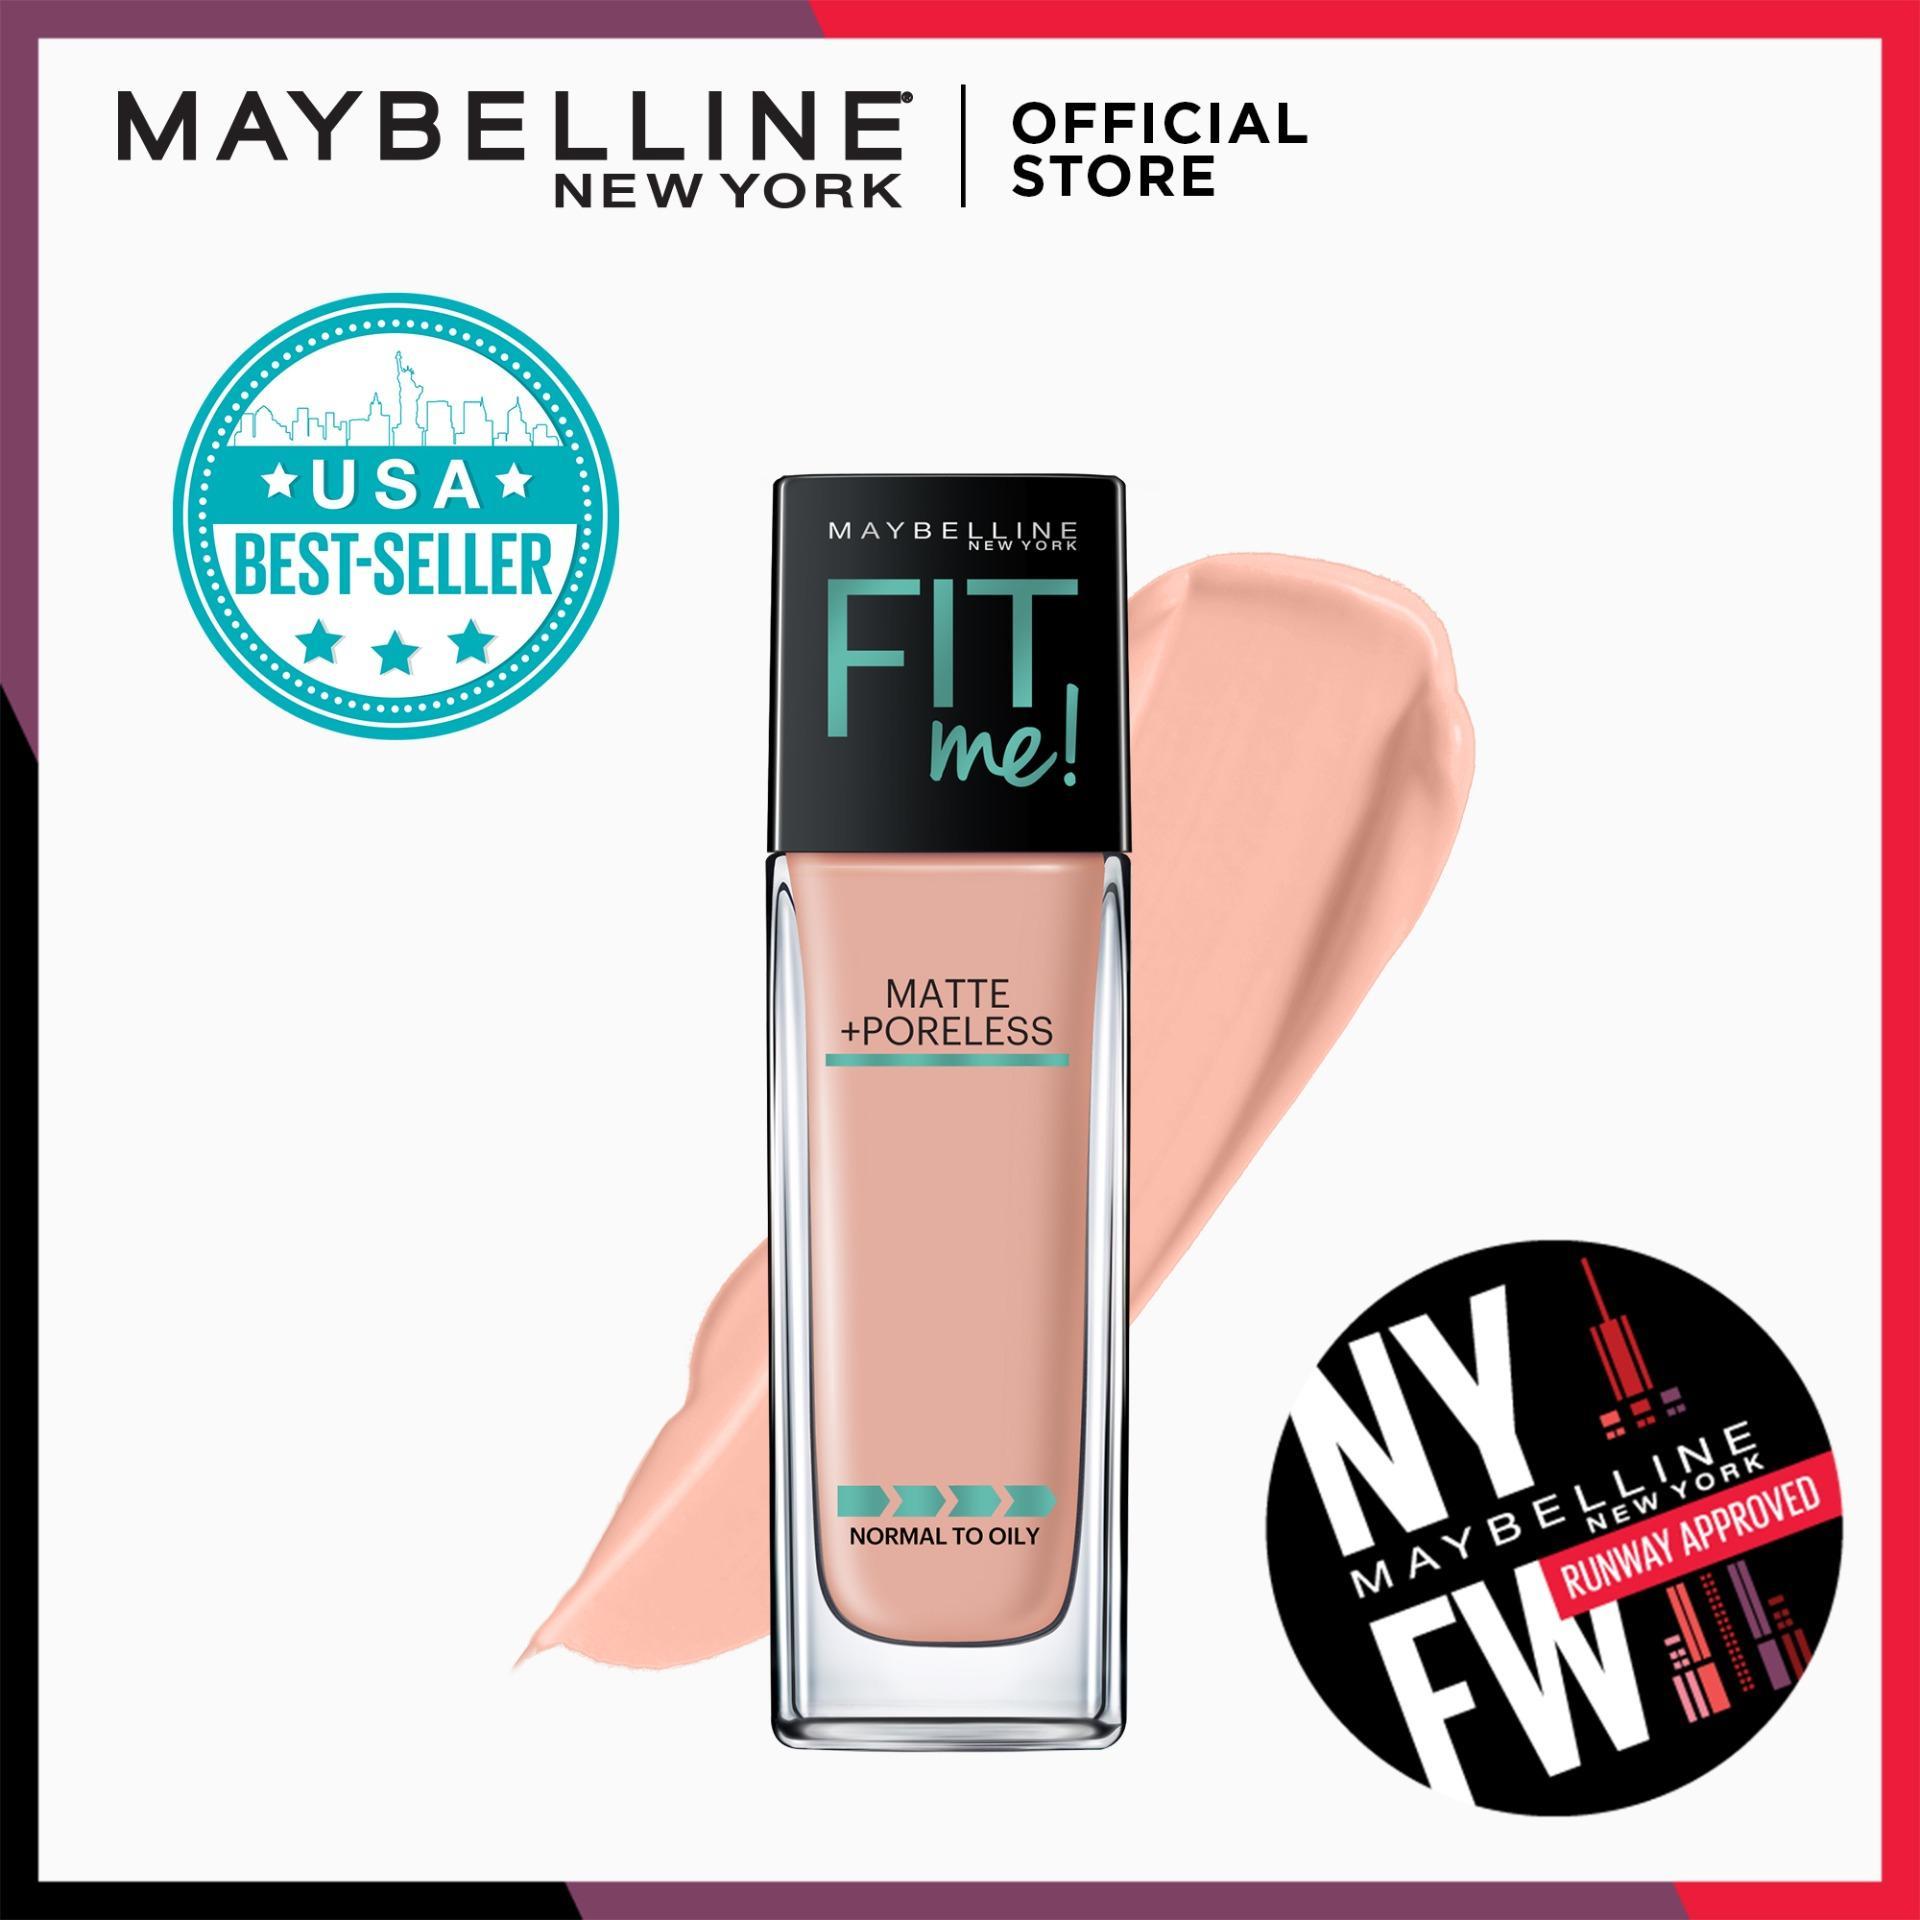 Fit Me Matte+Poreless Liquid Foundation - 122 Creamy Beige [USA Bestseller] by Maybelline Philippines